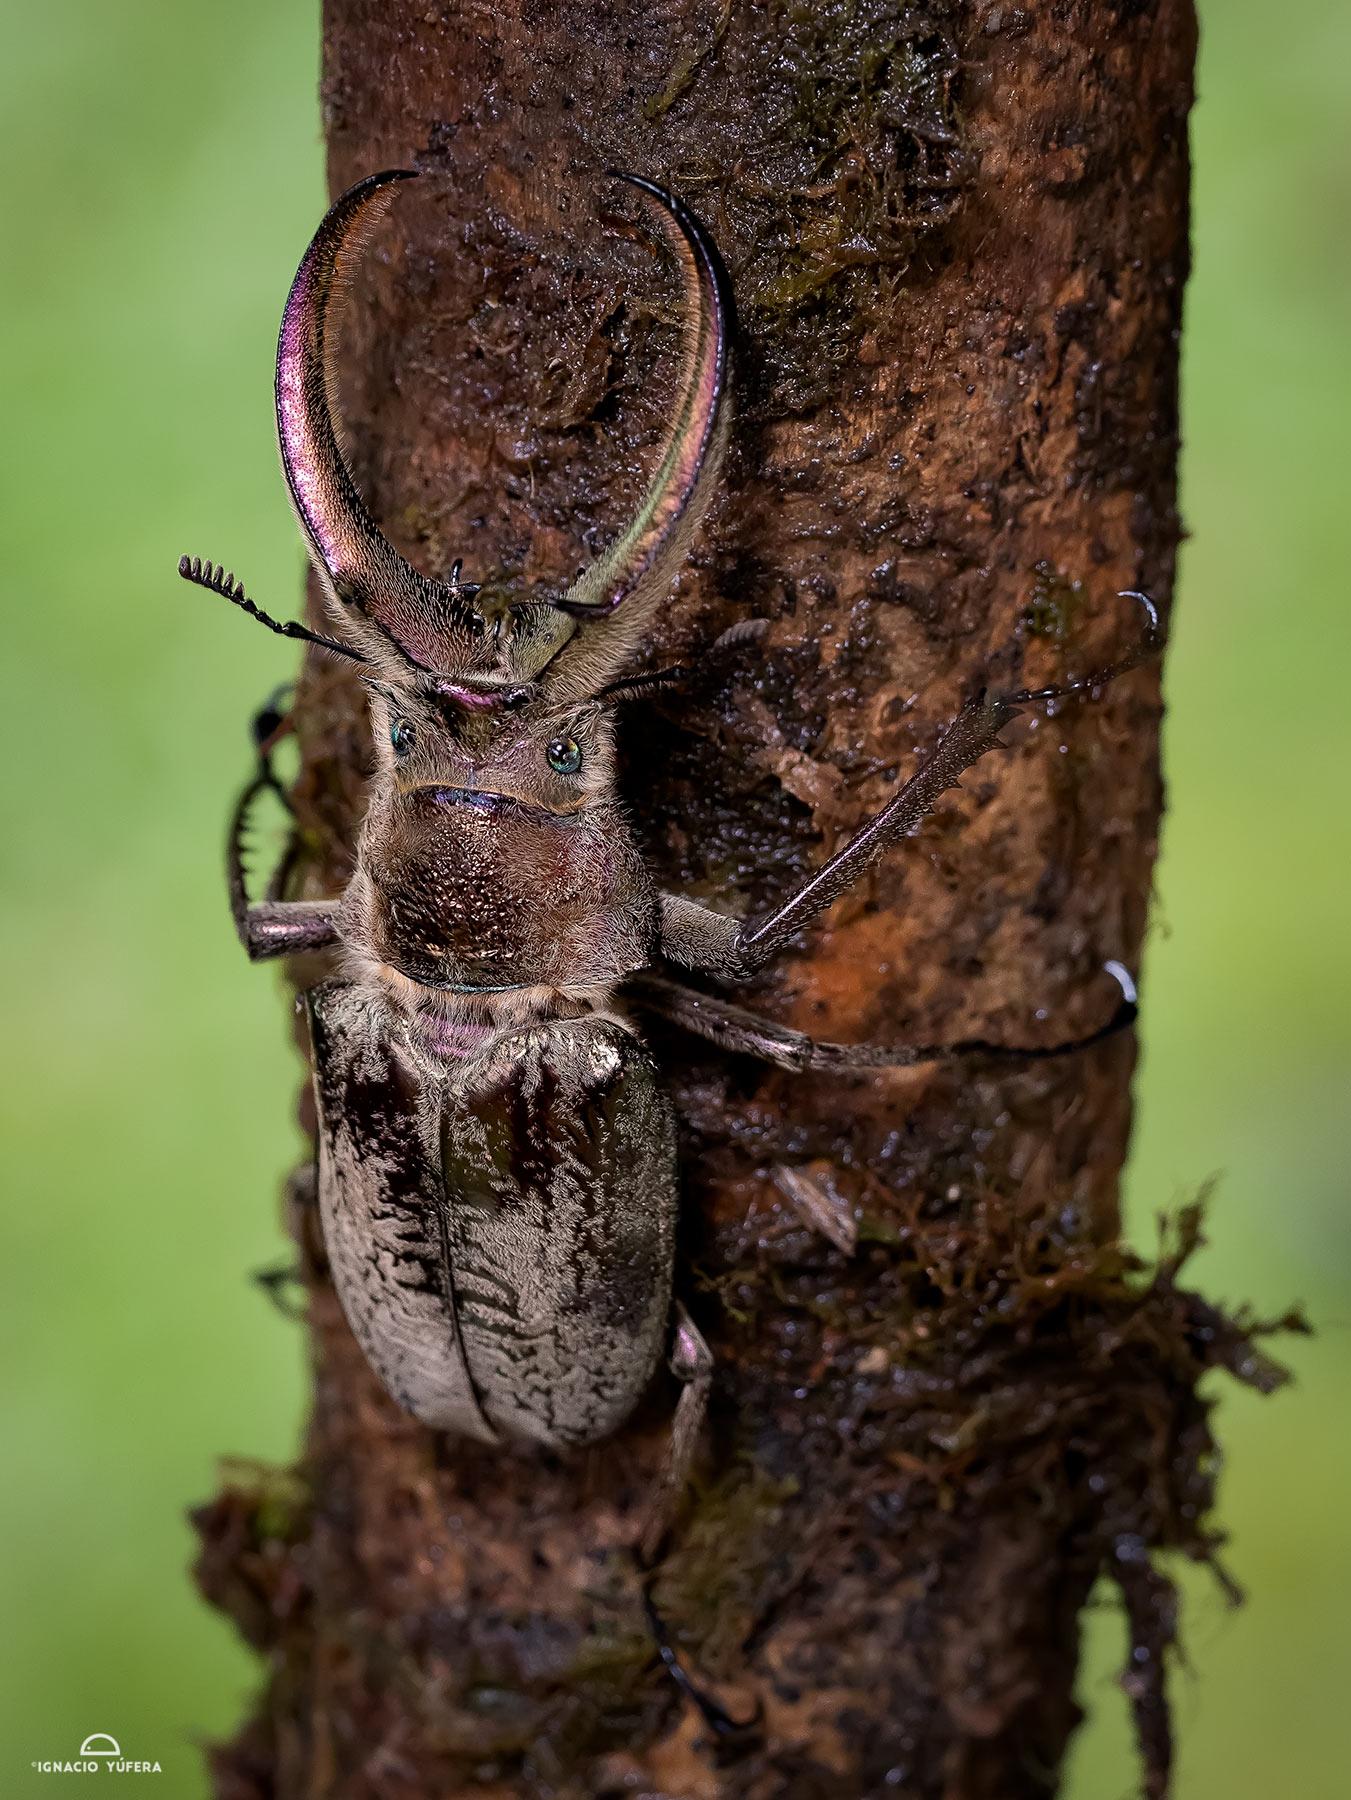 Stag beetle (Sphaenognathus feisthameli), Abra Patricia, Peru